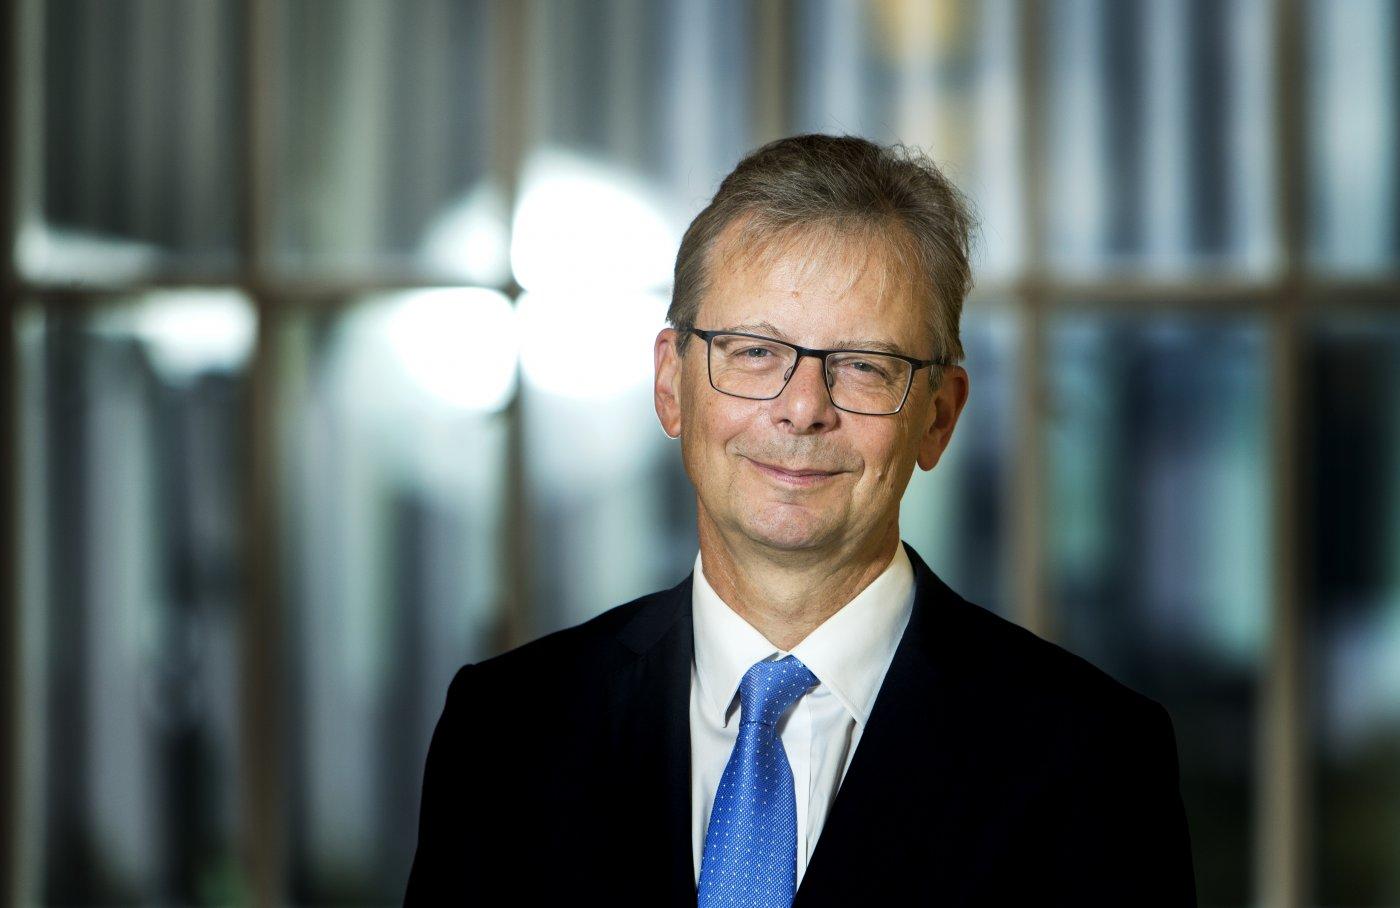 Jón Atli Benediktsson